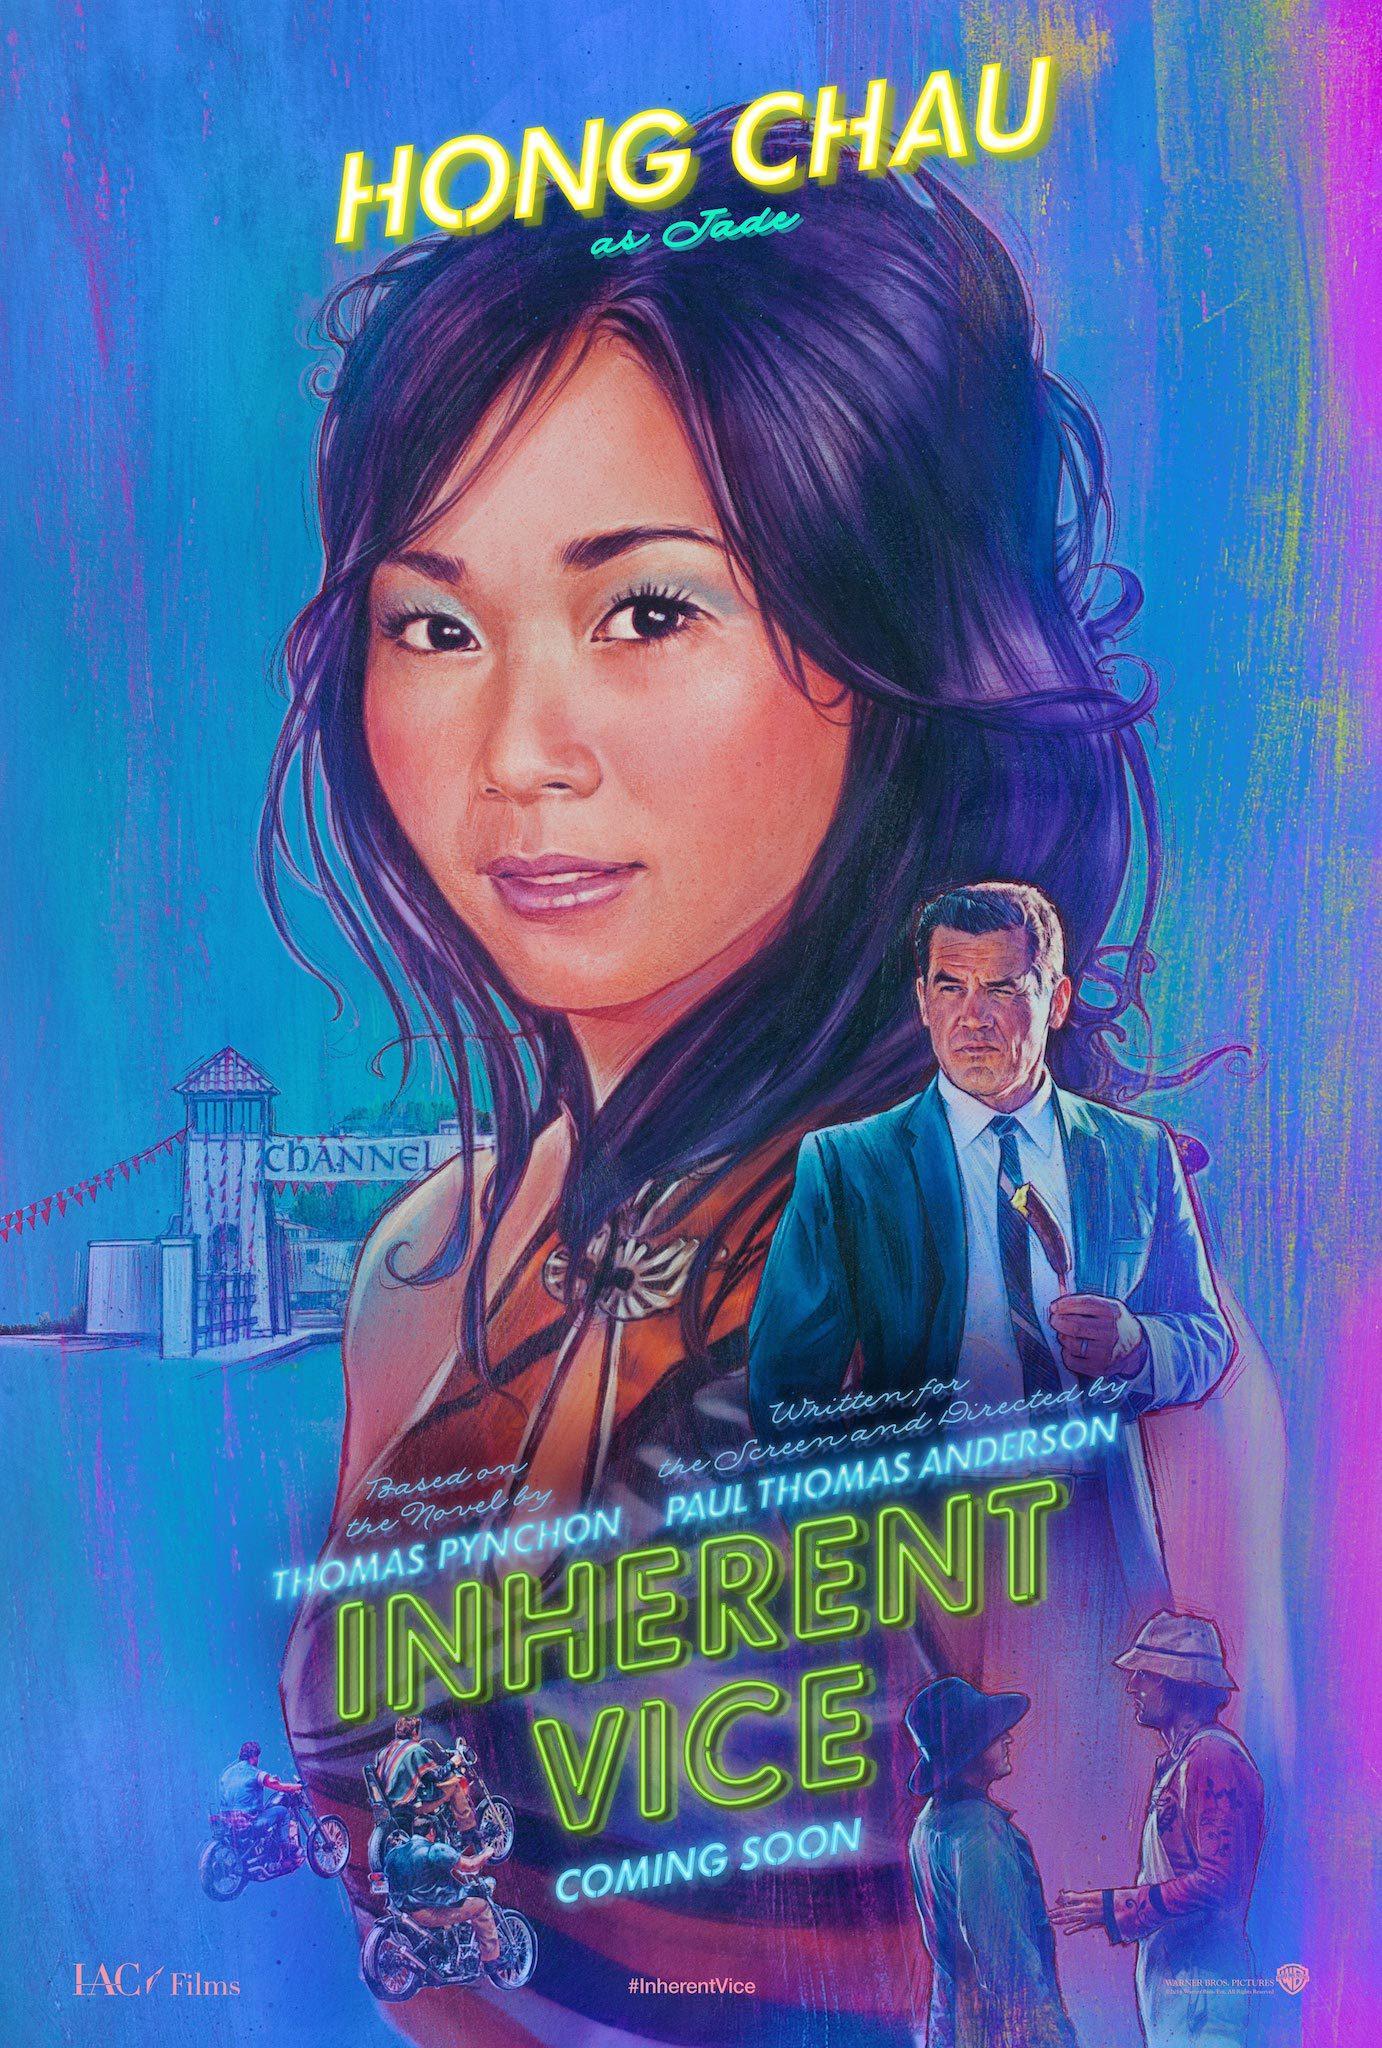 Josh Brolin and Hong Chau in Inherent Vice (2014)